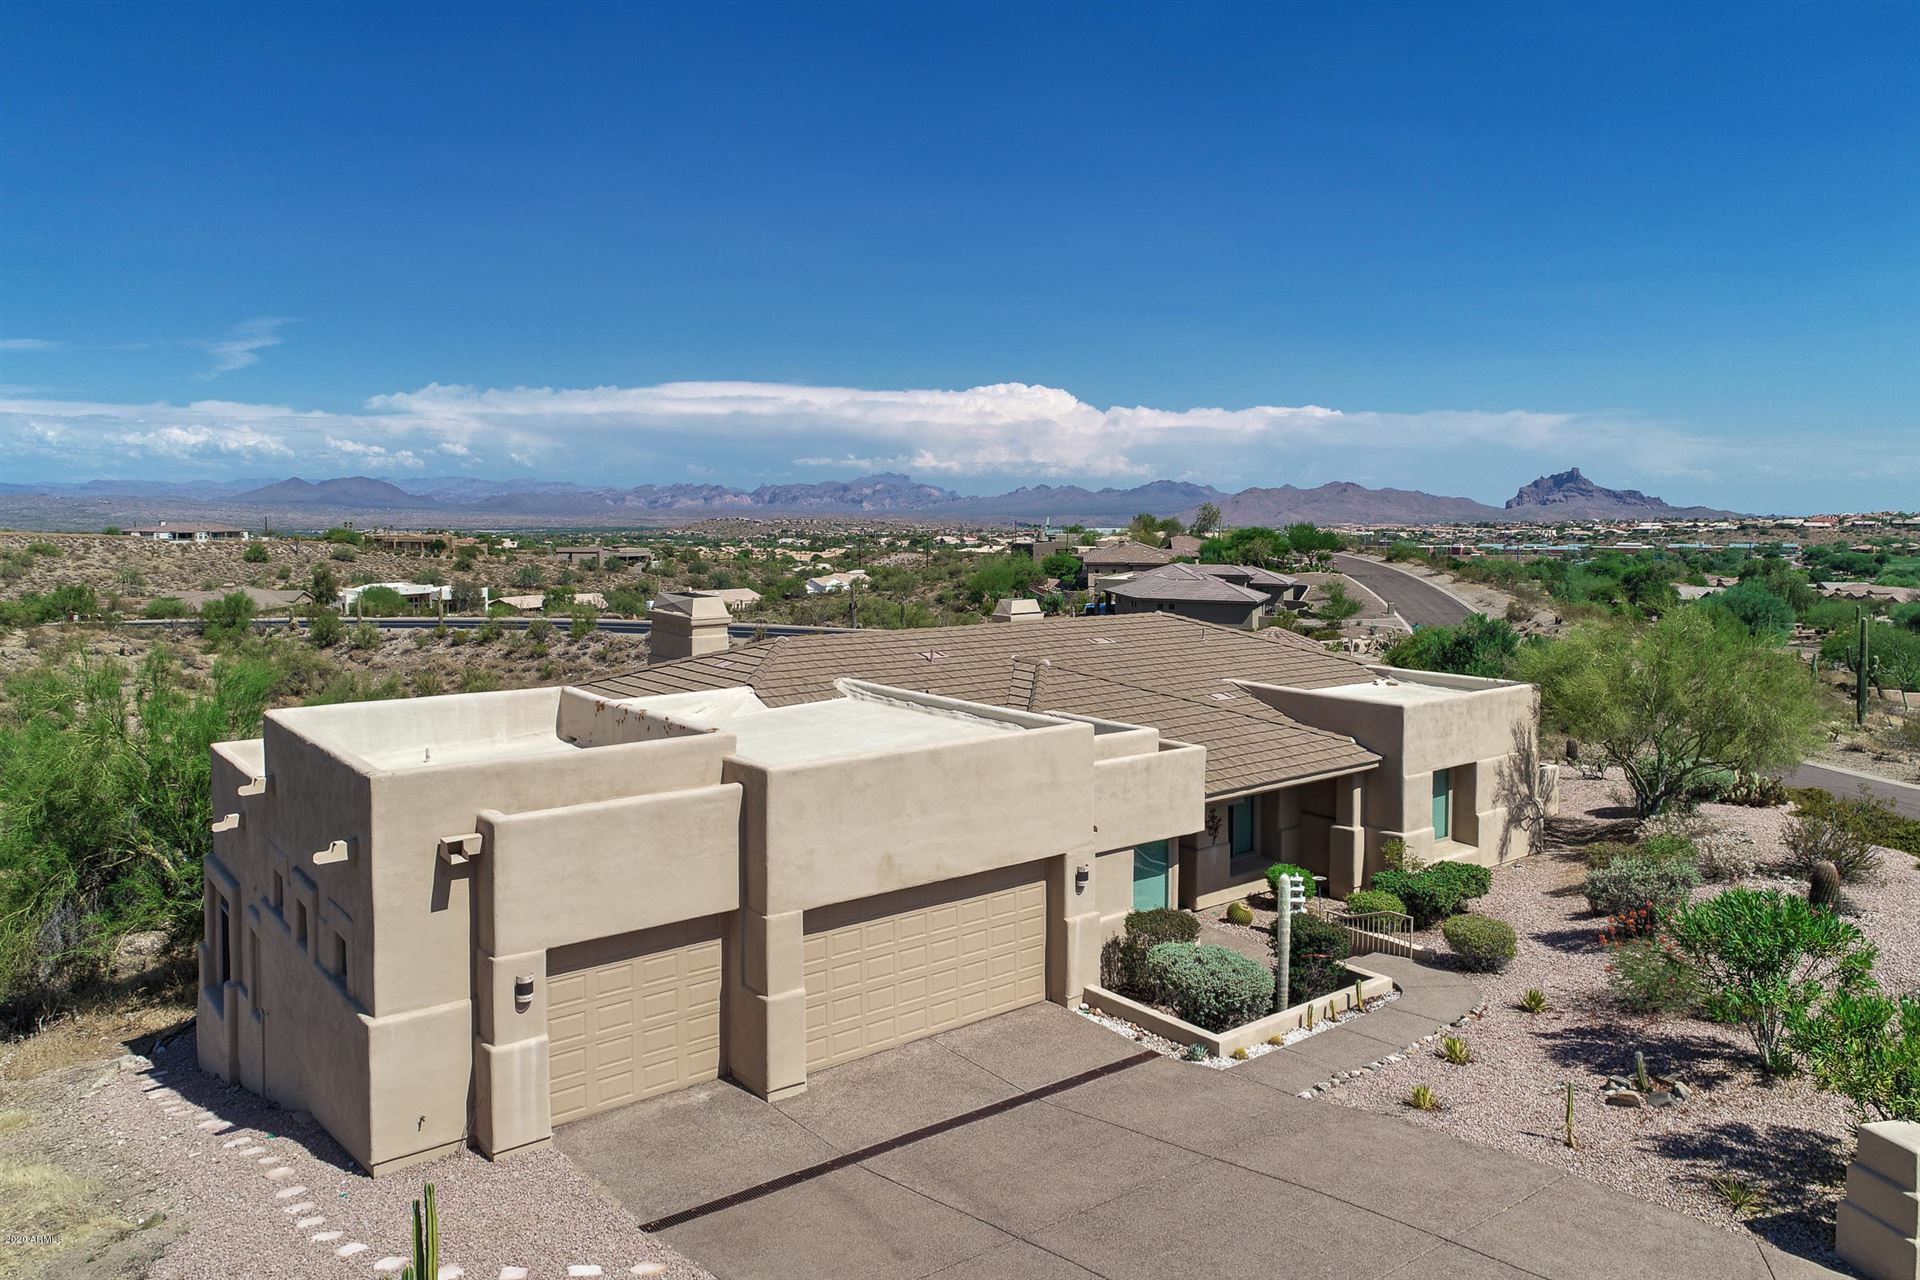 15742 E EAGLE CREST Road, Fountain Hills, AZ 85268 - MLS#: 6102205